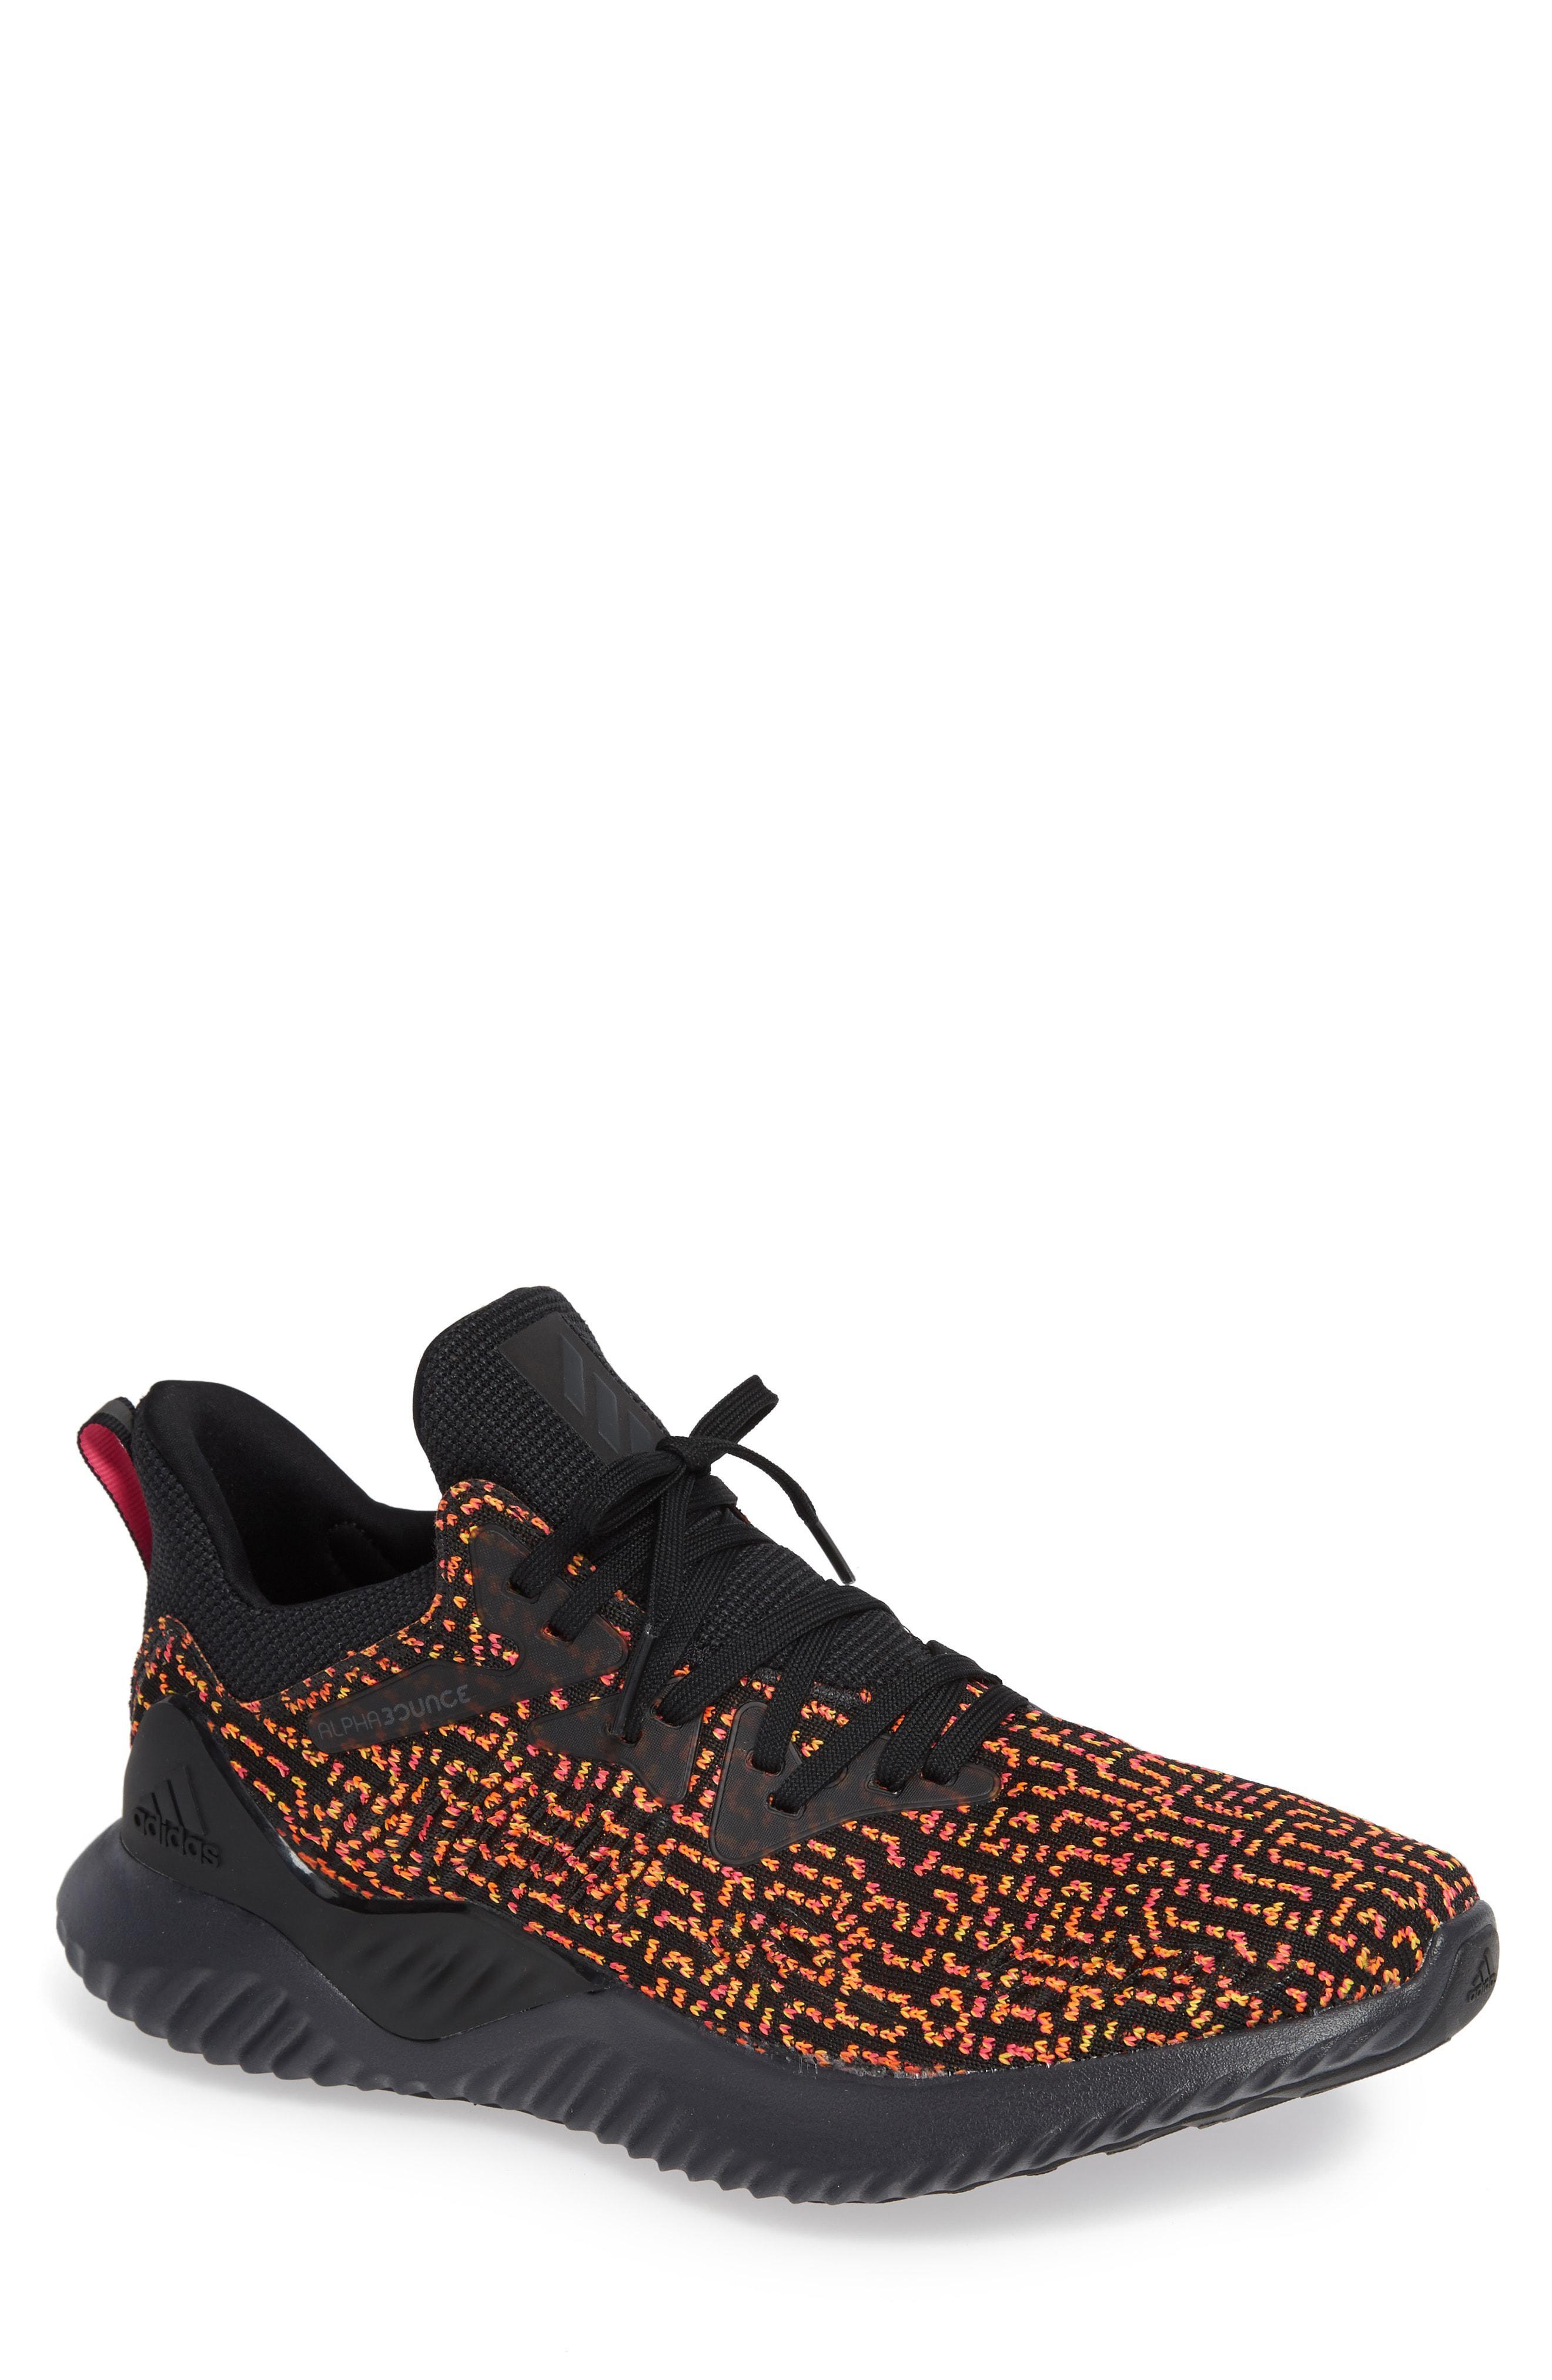 bd3a11e3c Adidas Alphabounce Beyond Ck Running Shoe in Black for Men - Lyst